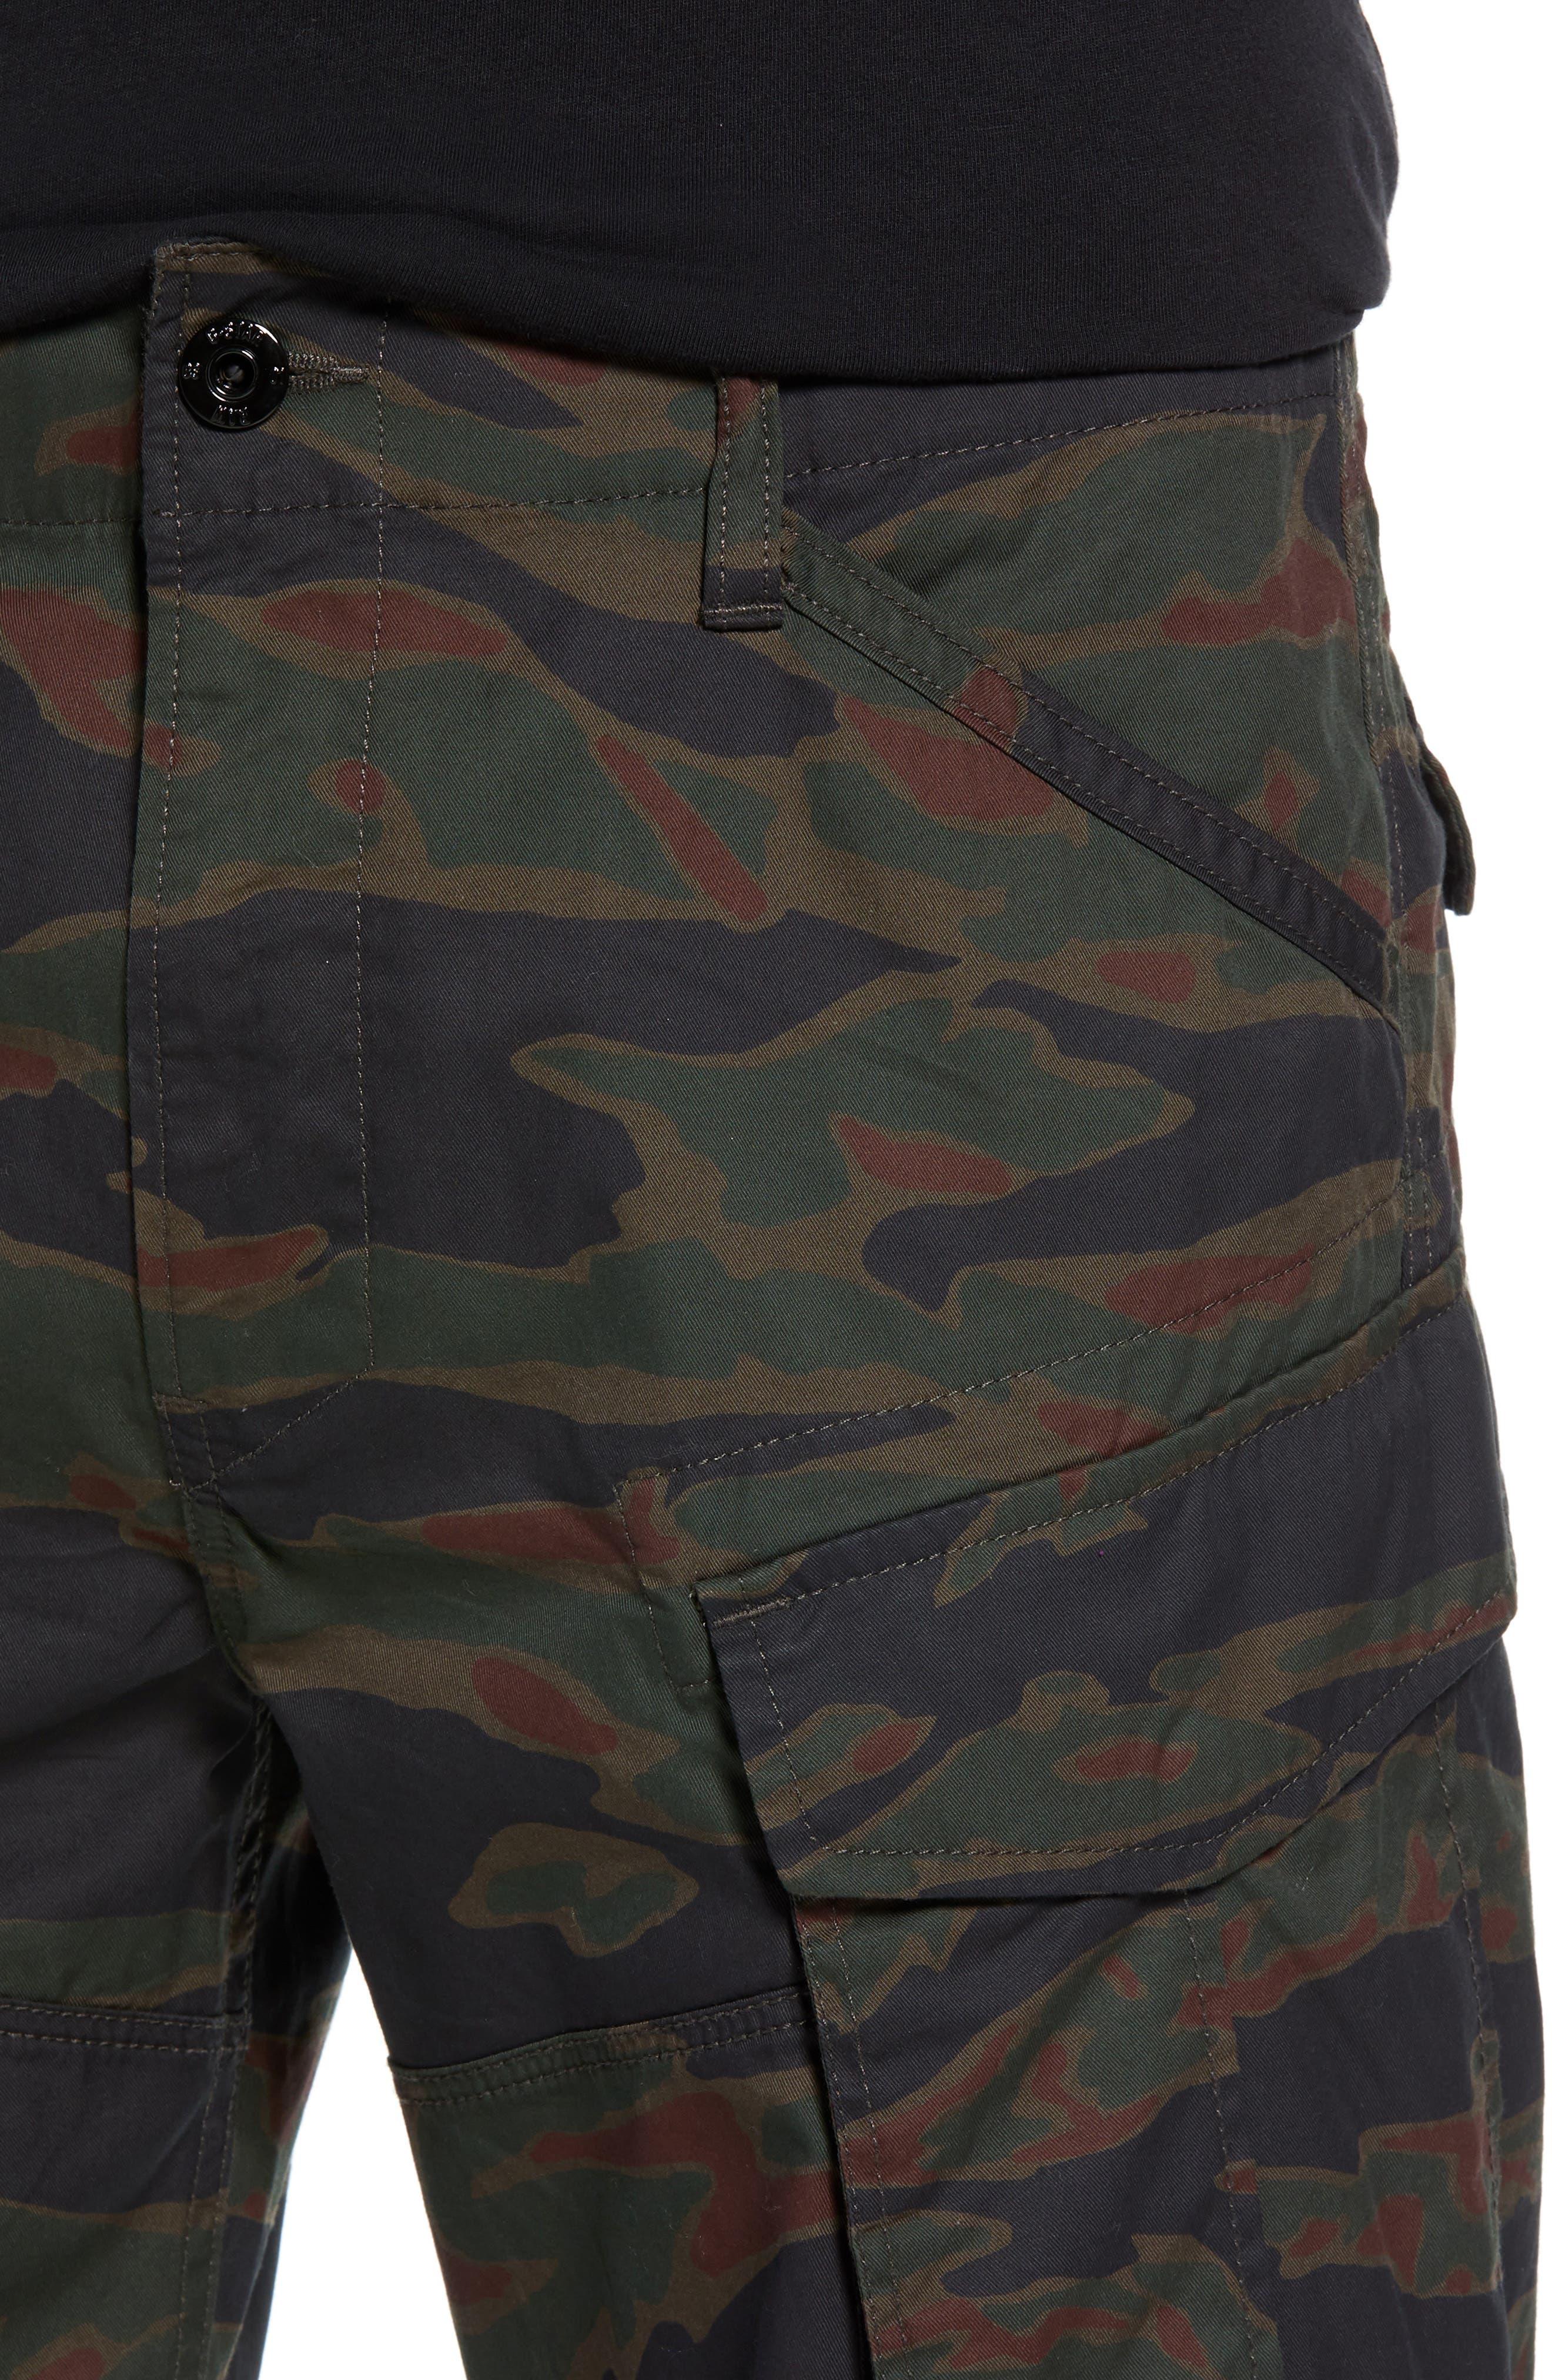 Rovic Tapered Cargo Pants,                             Alternate thumbnail 4, color,                             SMOKE GREEN/ DARK VERMO